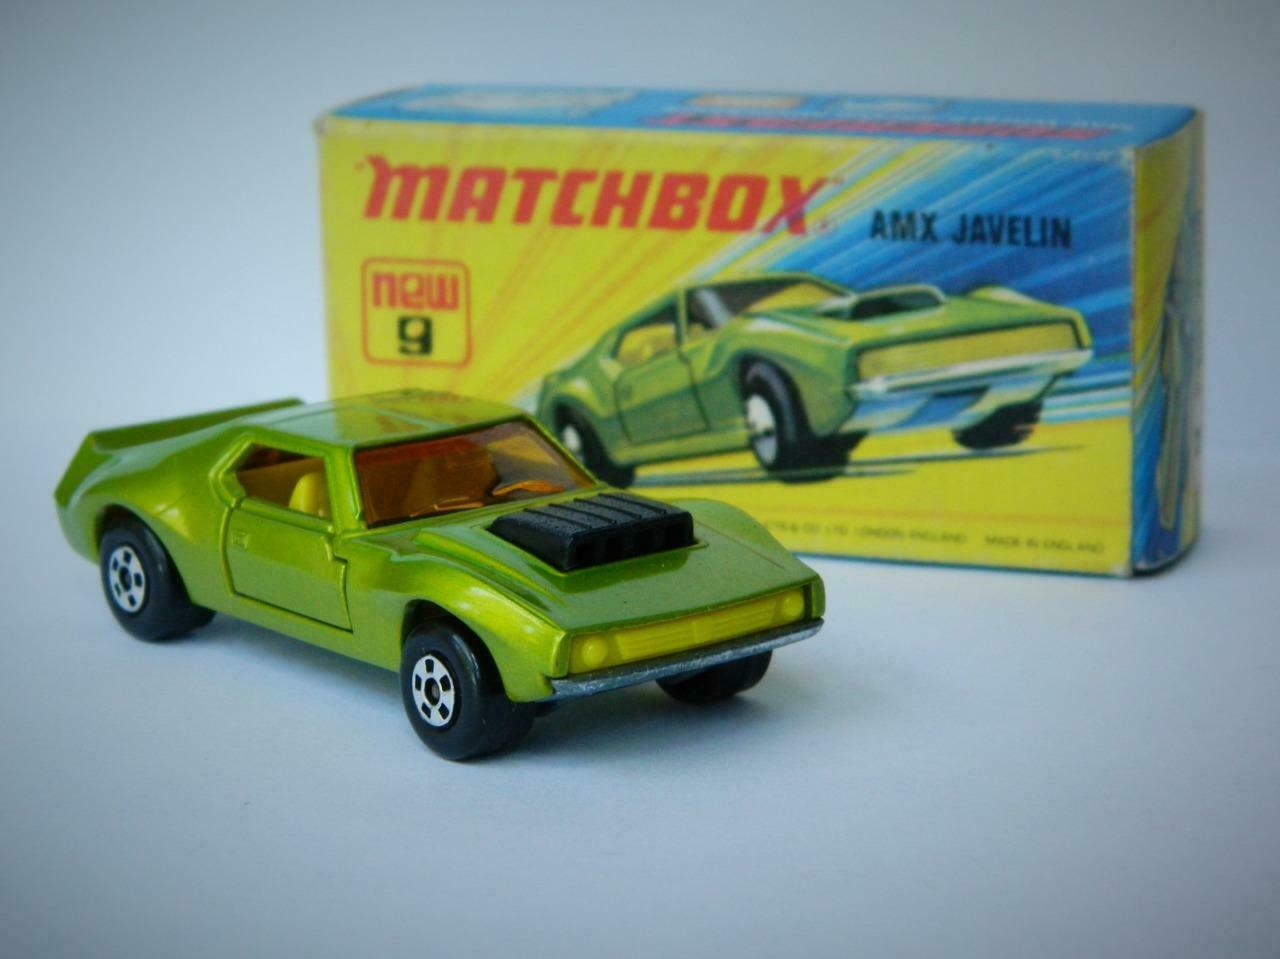 MATCHBOX LESNEY SUPERFAST AMX JAVELIN MINT IN EXCELLENT ORIGINAL I1 BOX 1972